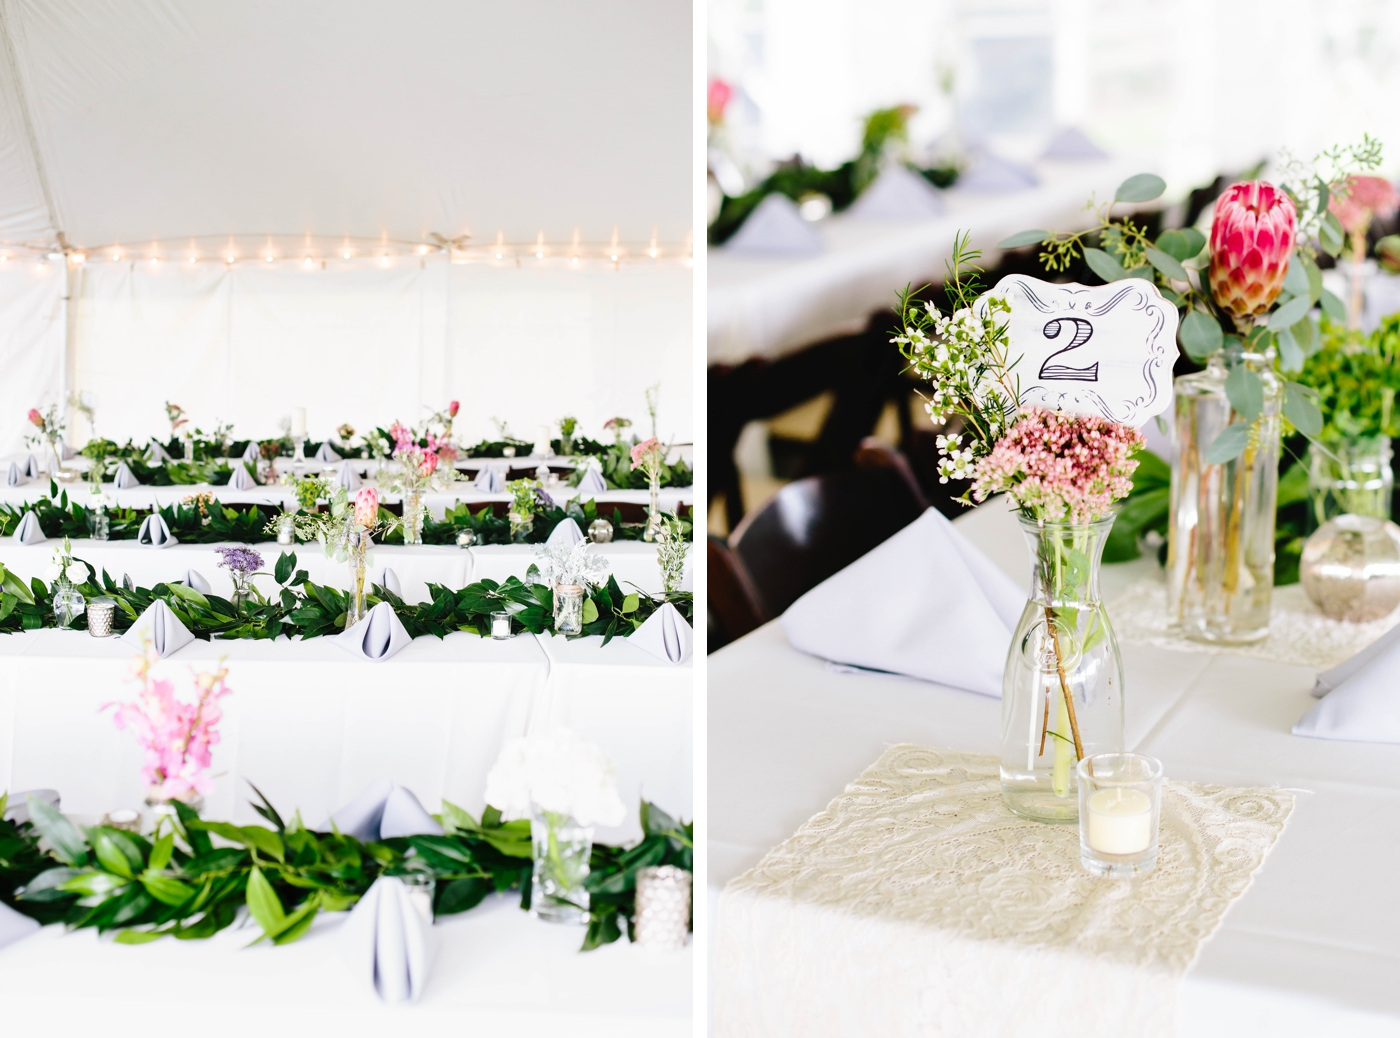 chicago-fine-art-wedding-photography-chriskelsey32